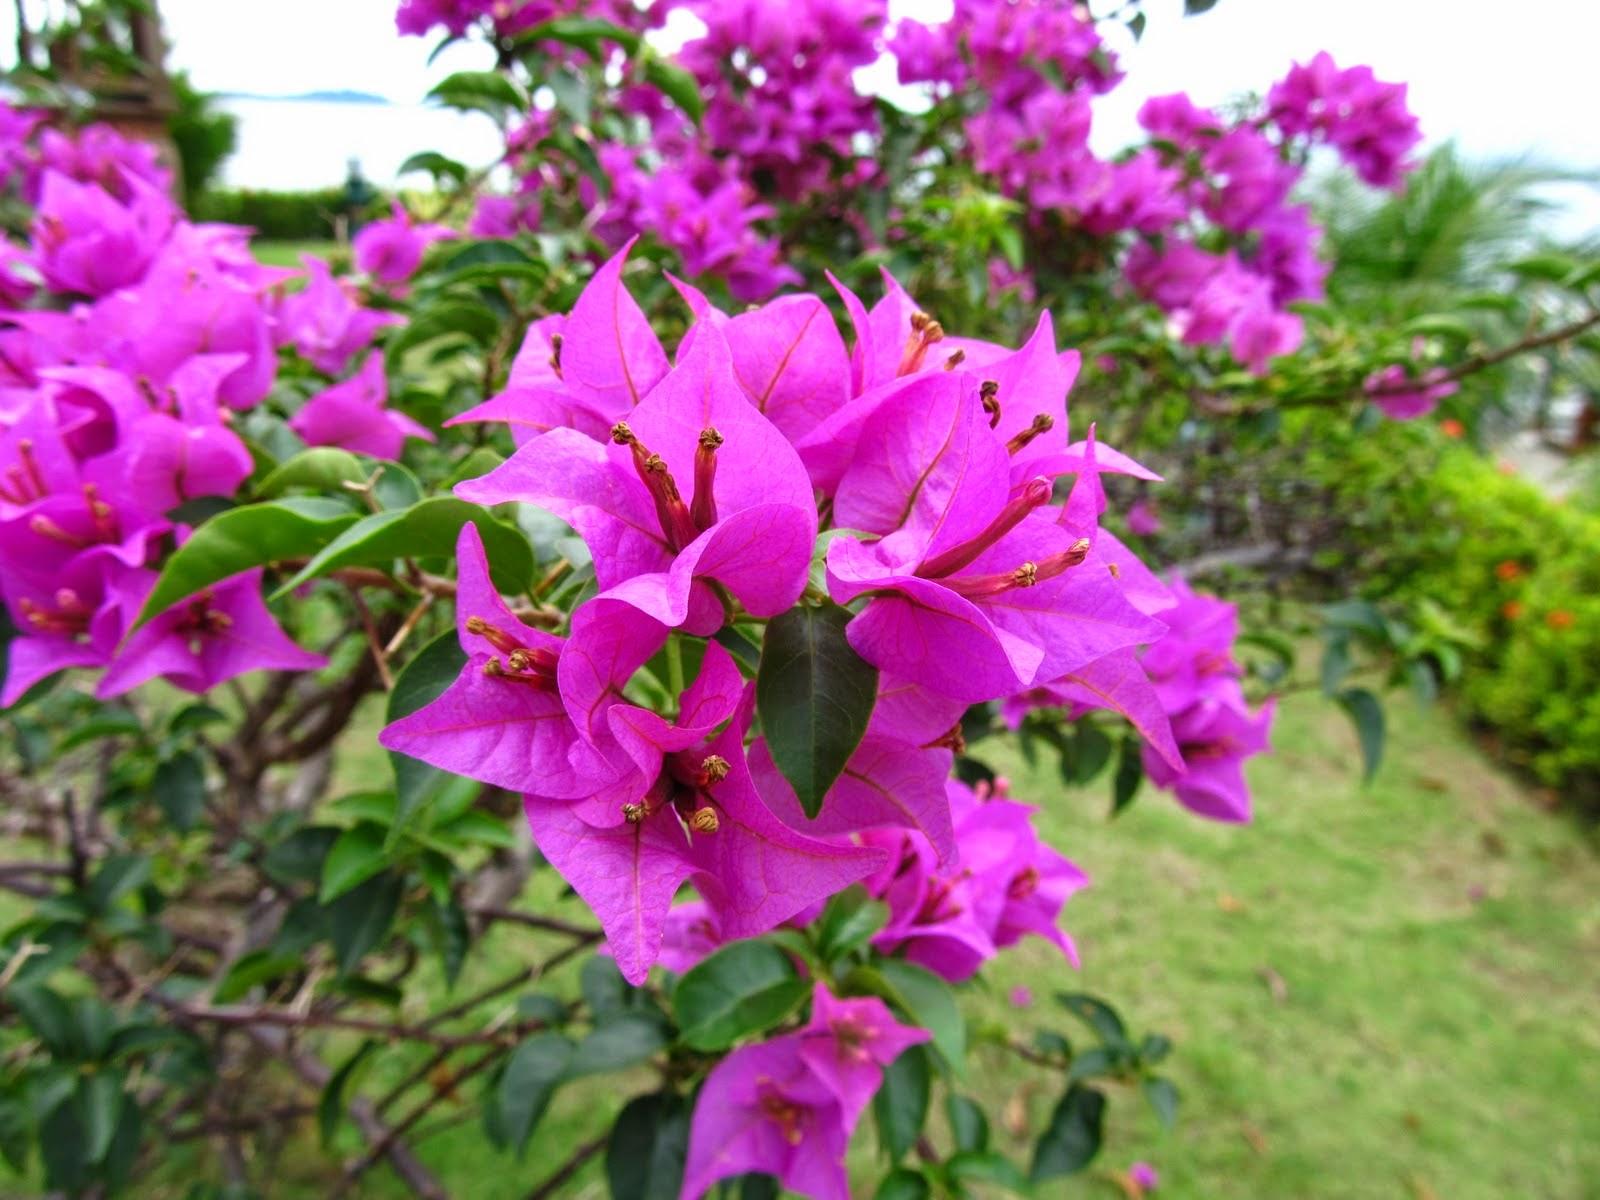 Contoh bunga sempurna pada tanaman bunga  Manfaat di